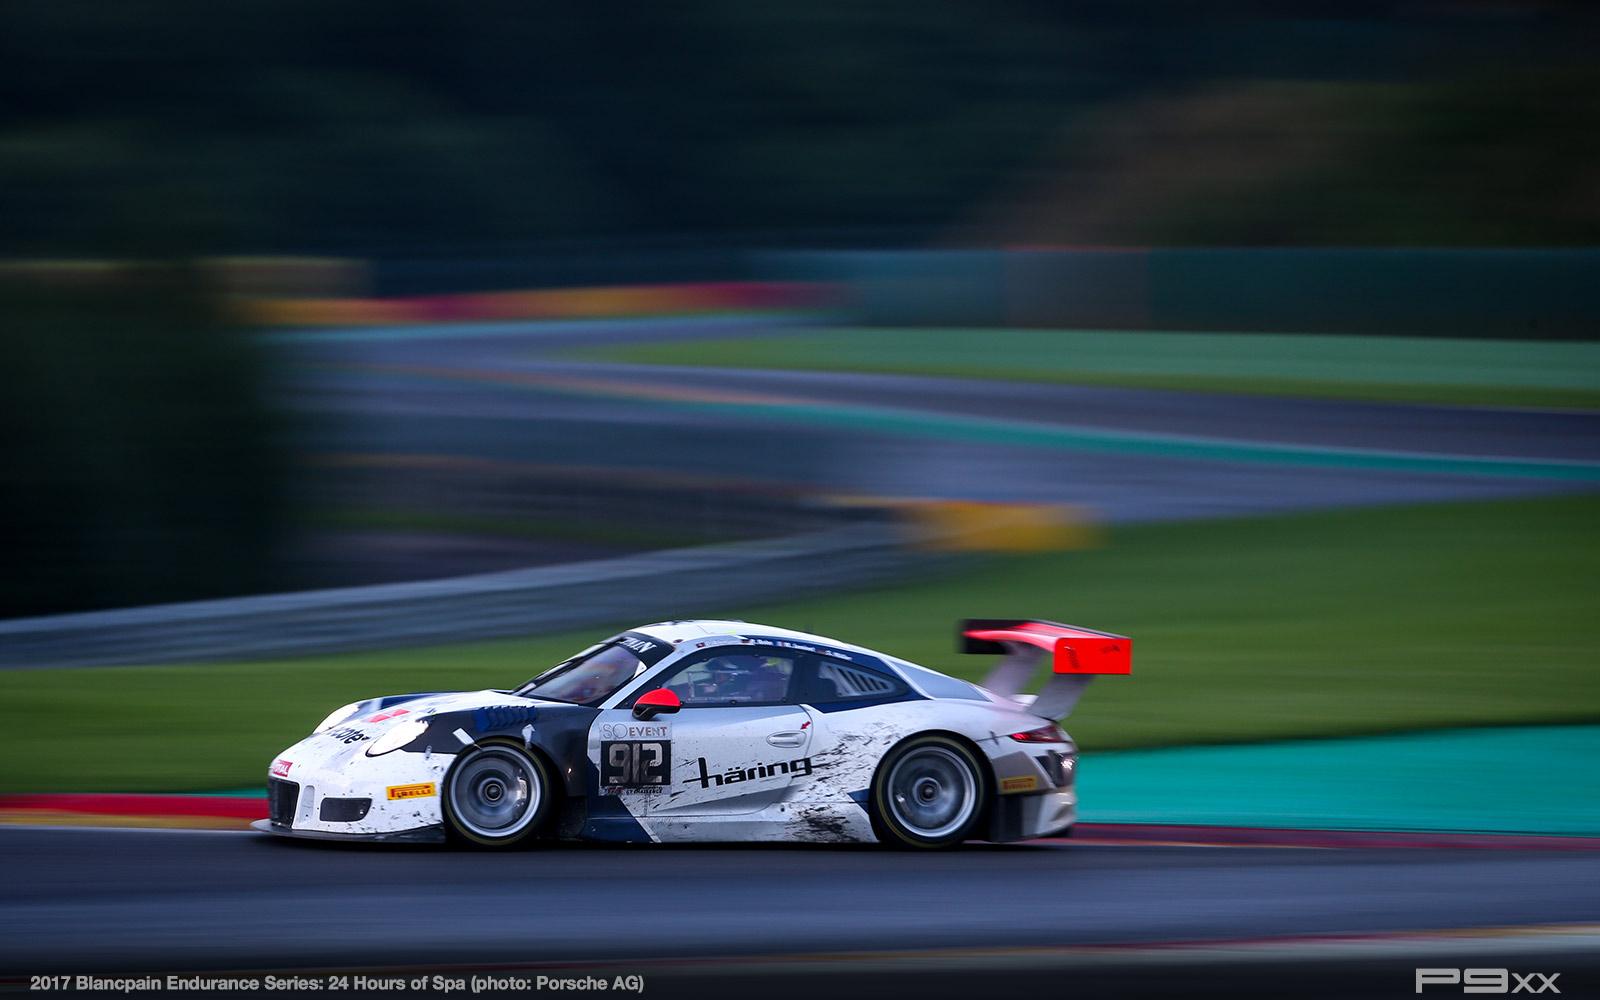 2017-24-Hours-of-Spa-Porsche-366